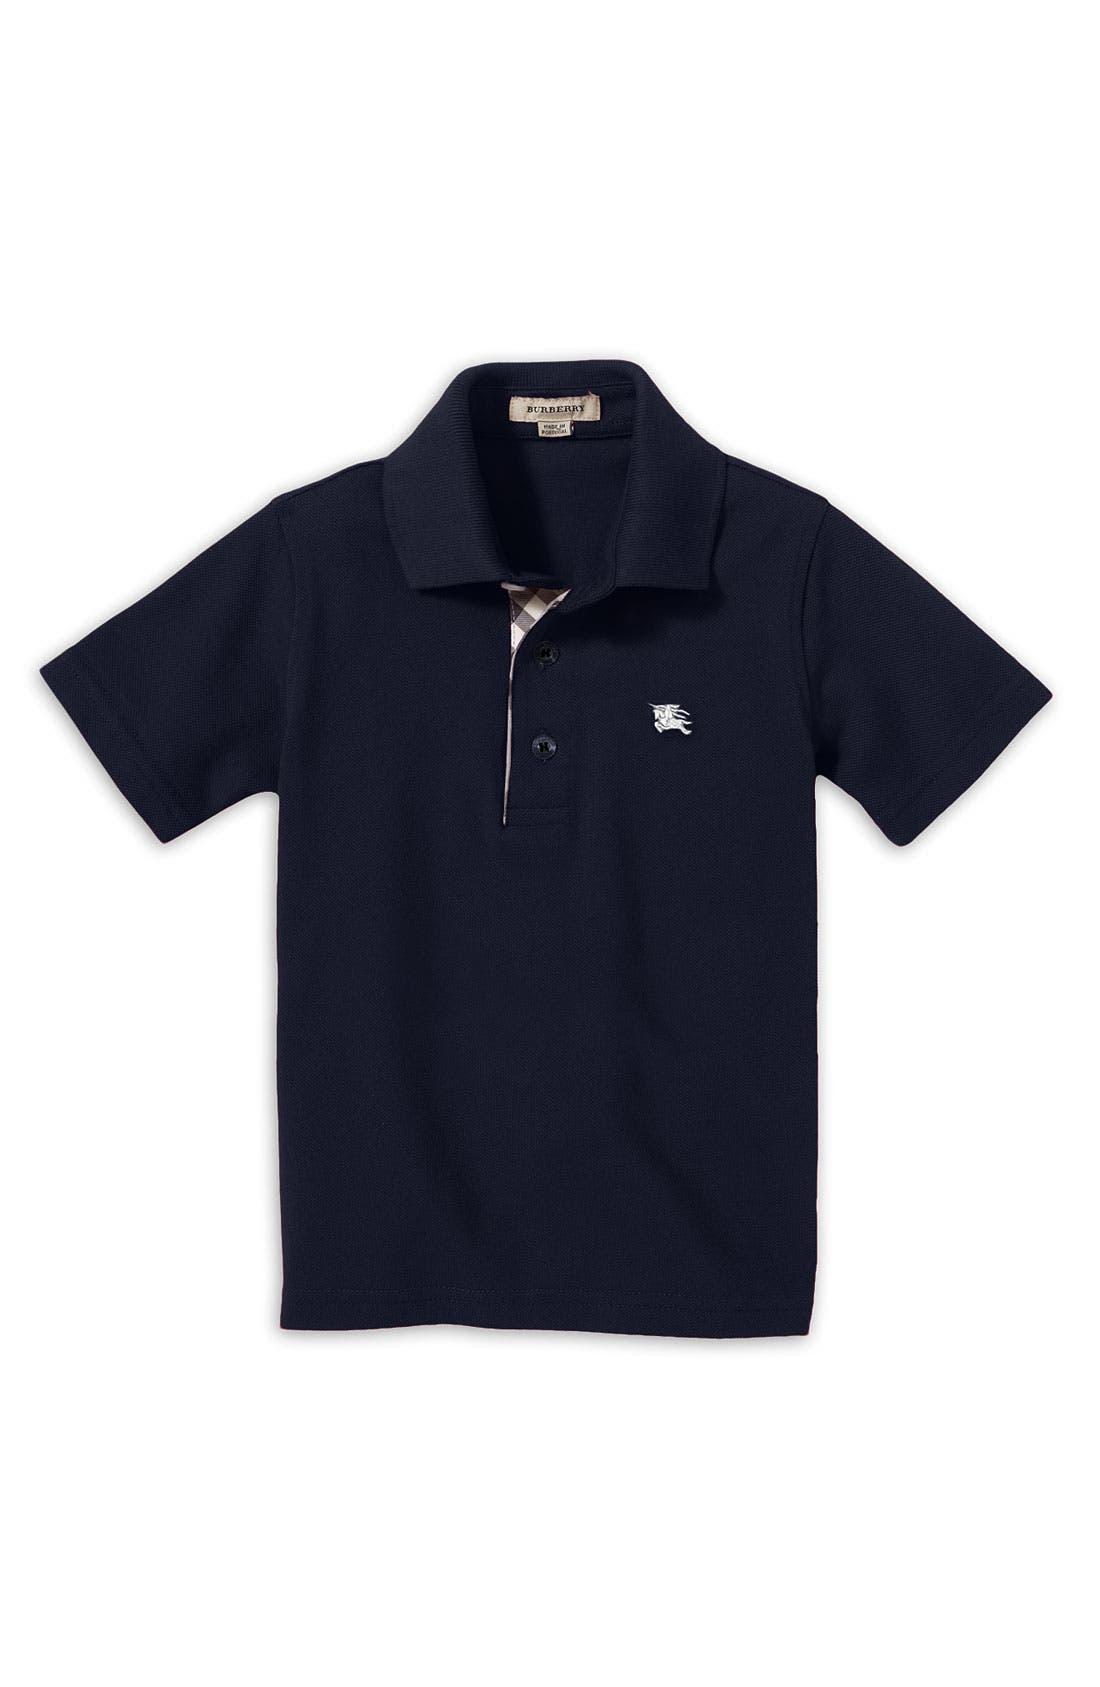 Main Image - Burberry Short Sleeve Polo Shirt (Big Boys)